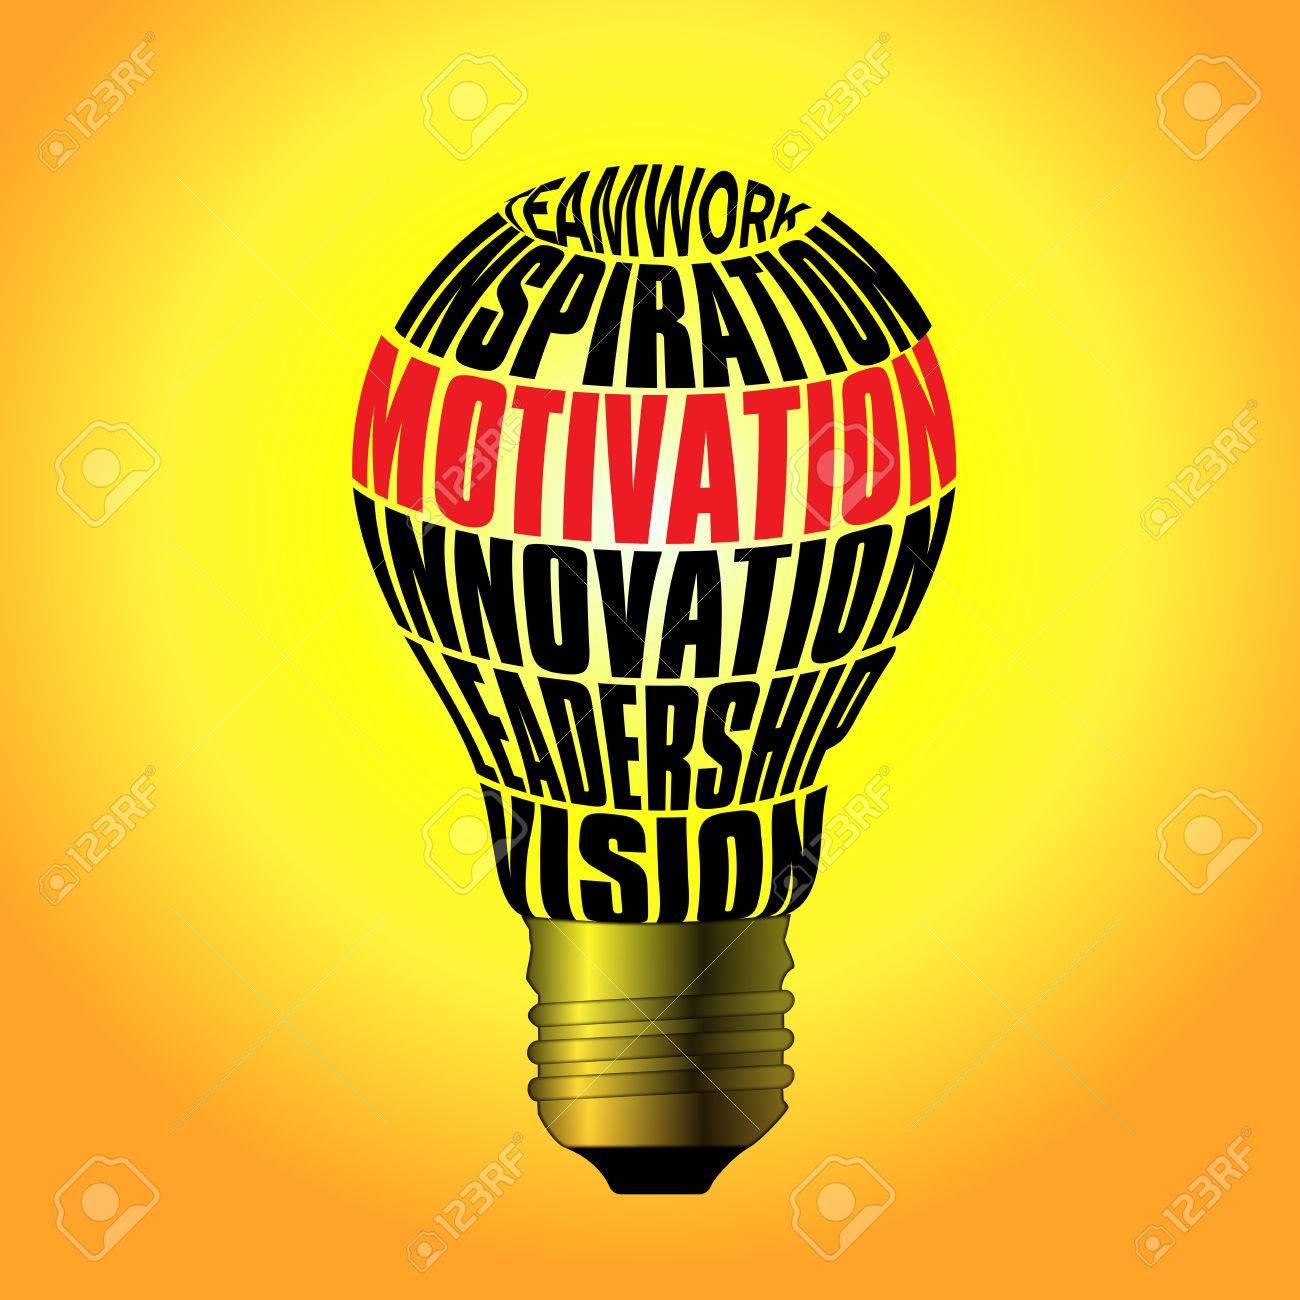 bulb of teamwork inspiration motivation innovation leadership bulb of teamwork inspiration motivation innovation leadership vision stock photo